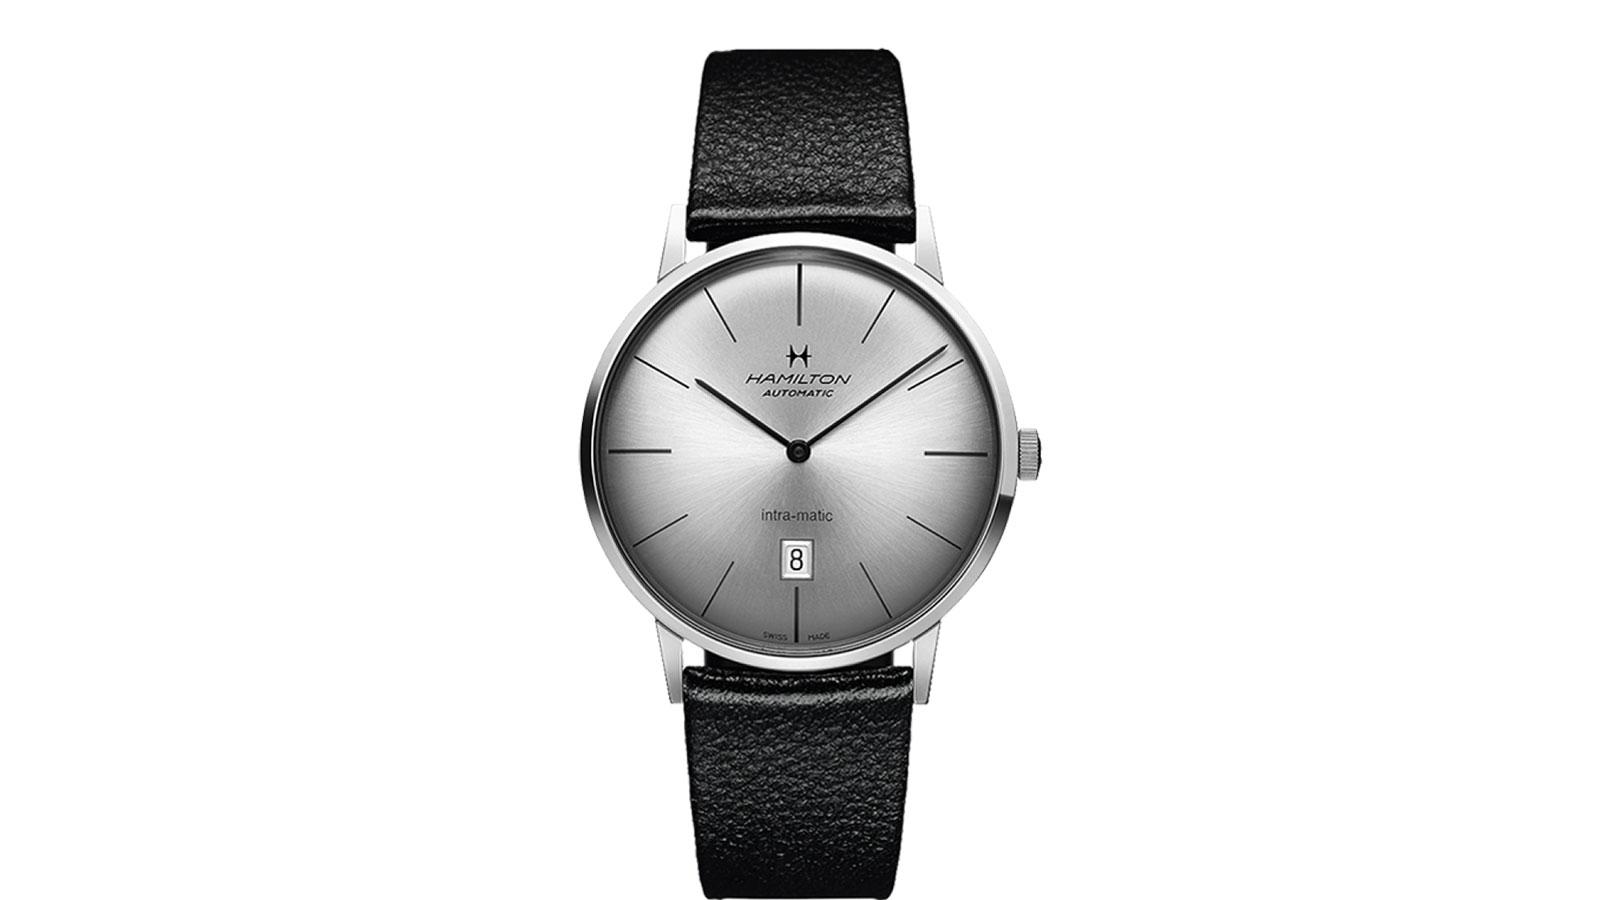 Hamilton Intra-Matic Minimalist Watch | best minimalist watches for men